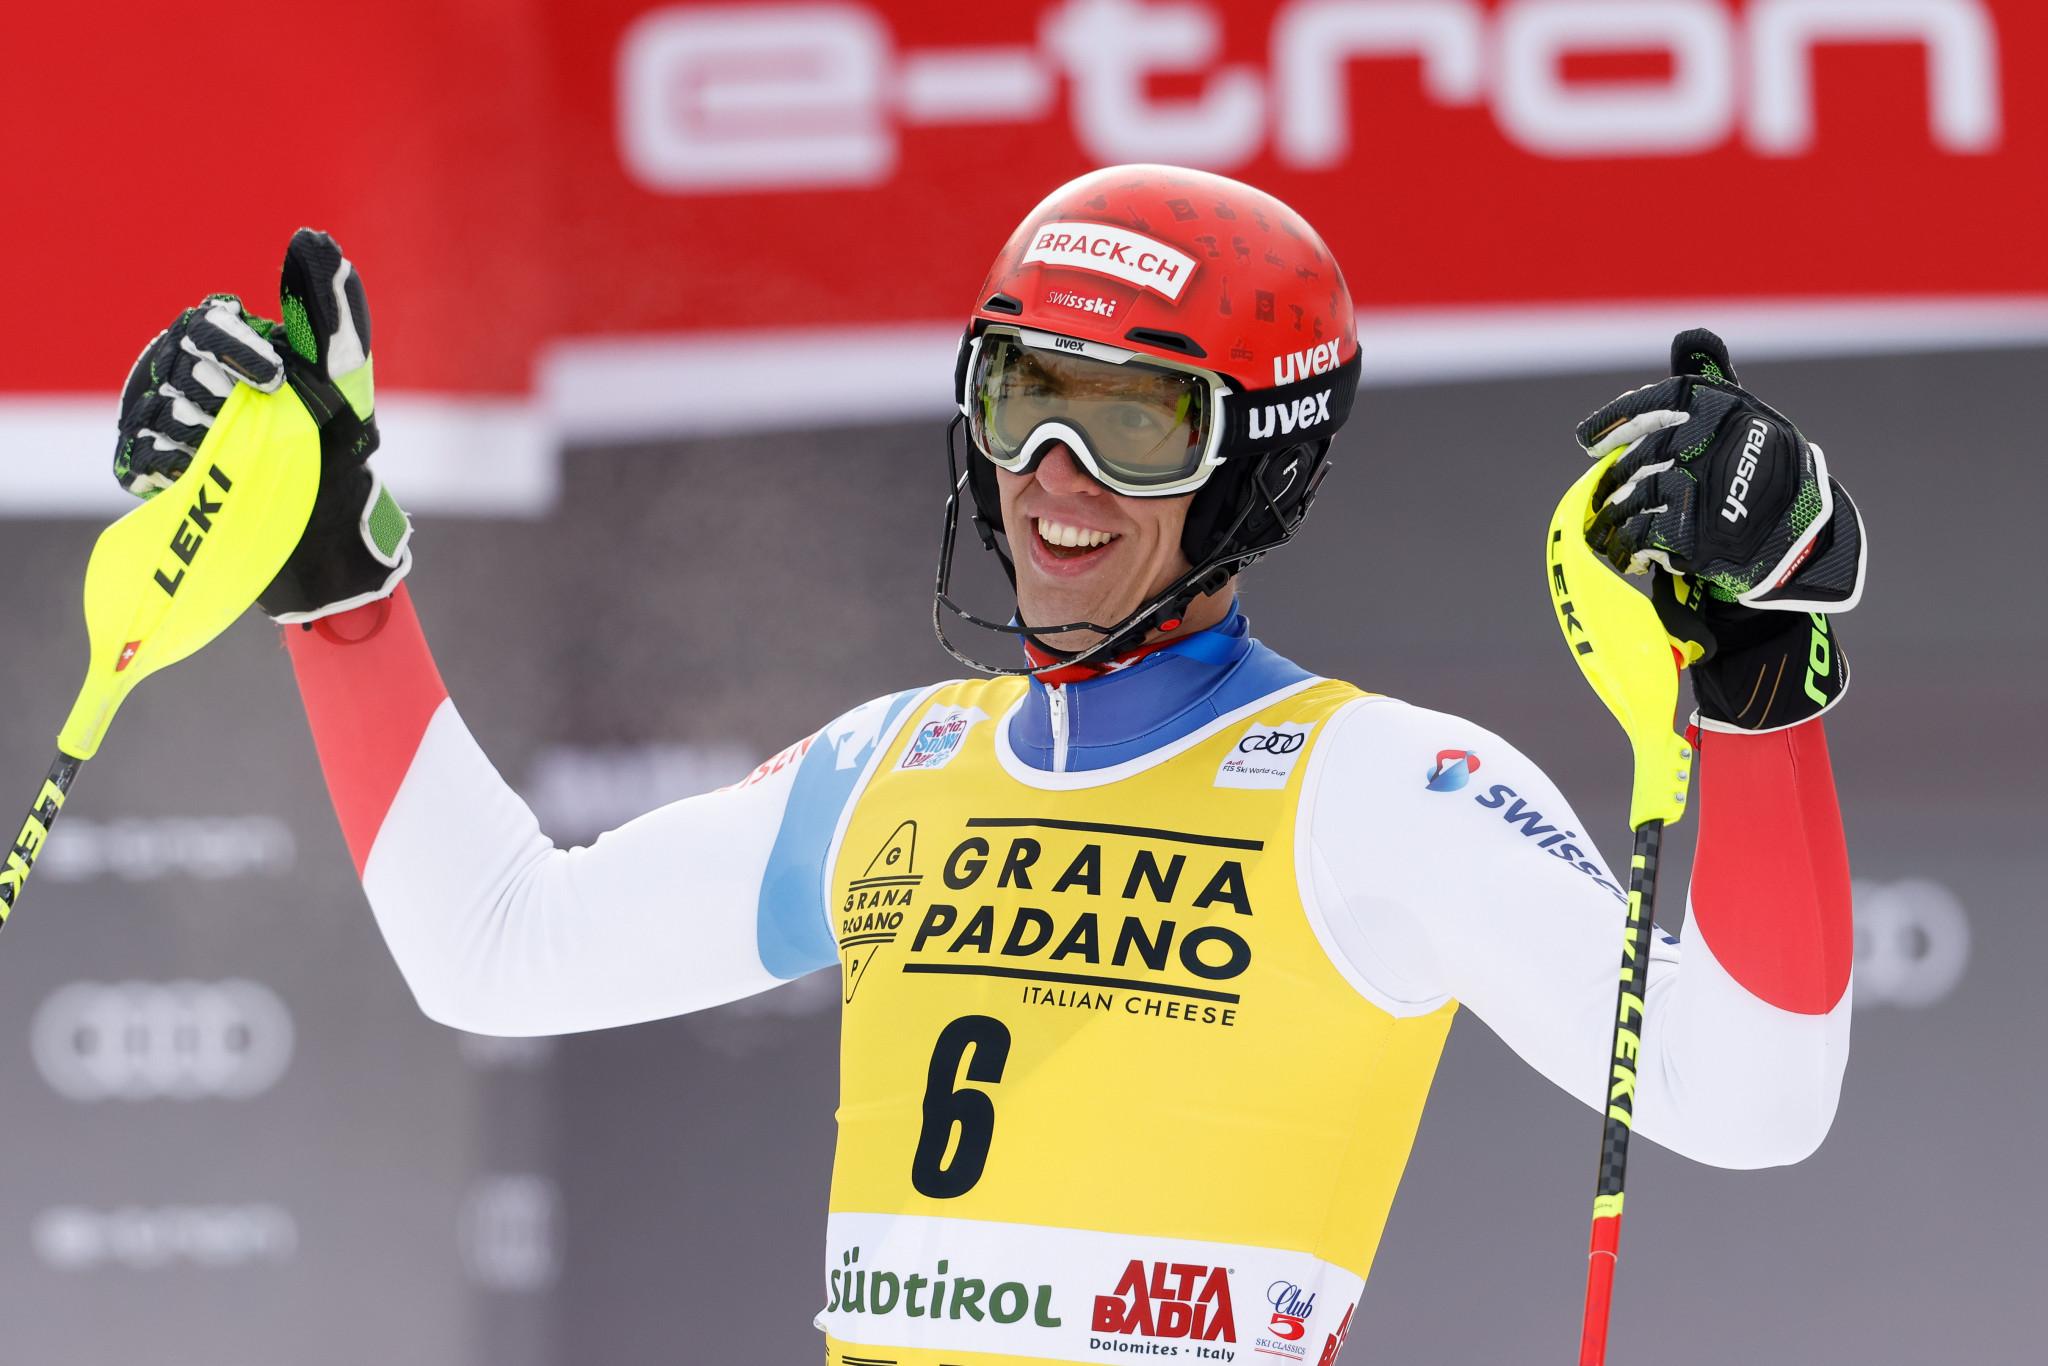 Zenhäusern wins fourth FIS Alpine Ski World Cup race in Alta Badia